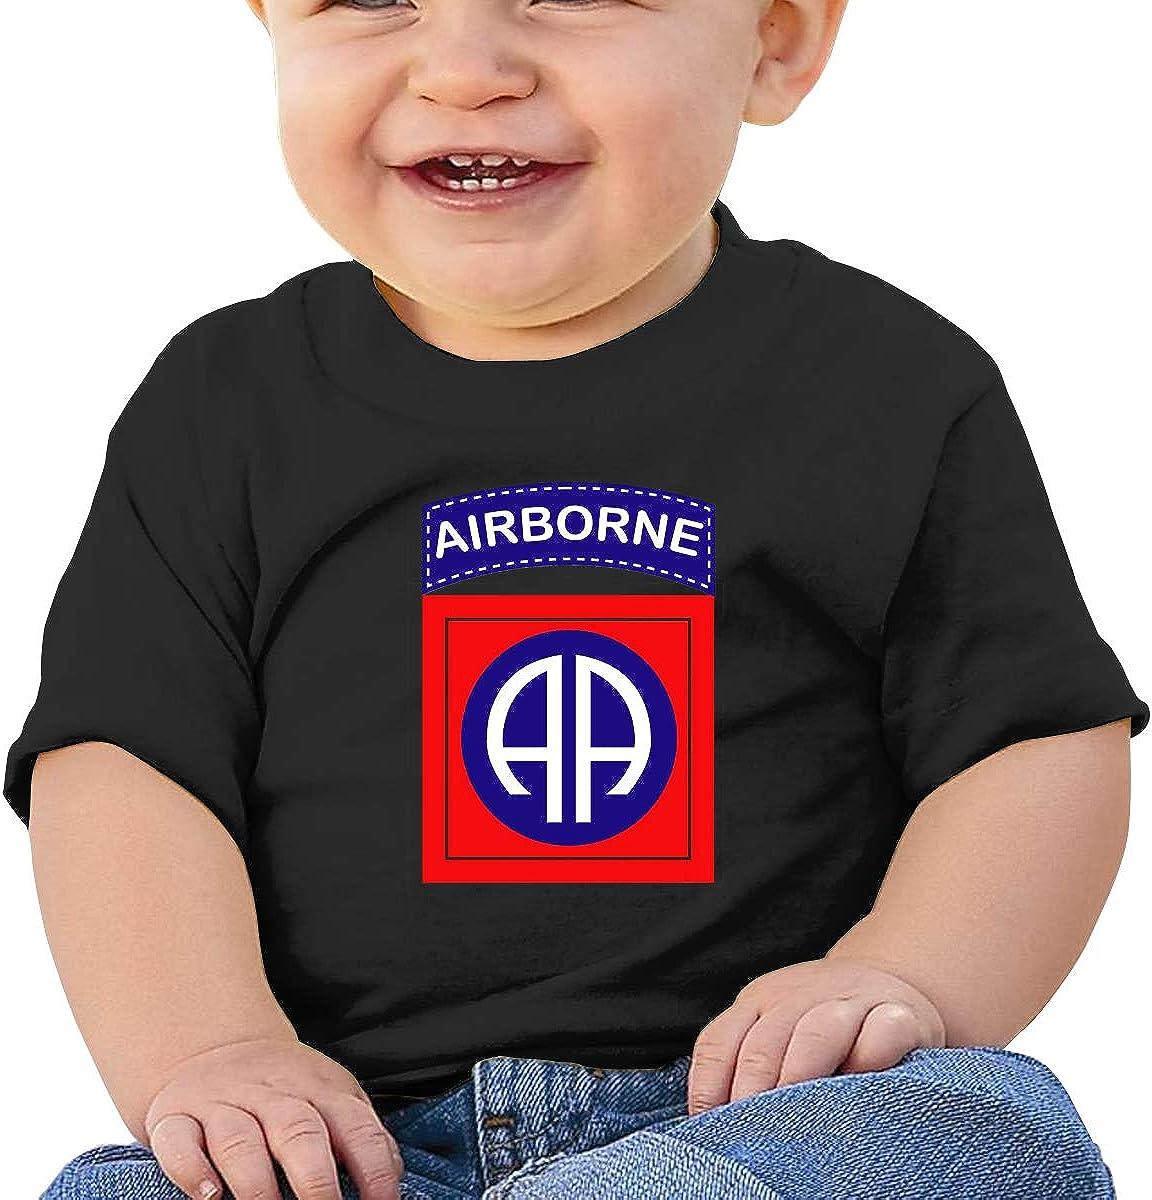 Zippem 82nd Airborne Division Short Sleeve T-Shirt Best for Baby Toddler//Infant Kids T-Shirt Close Skin Soft